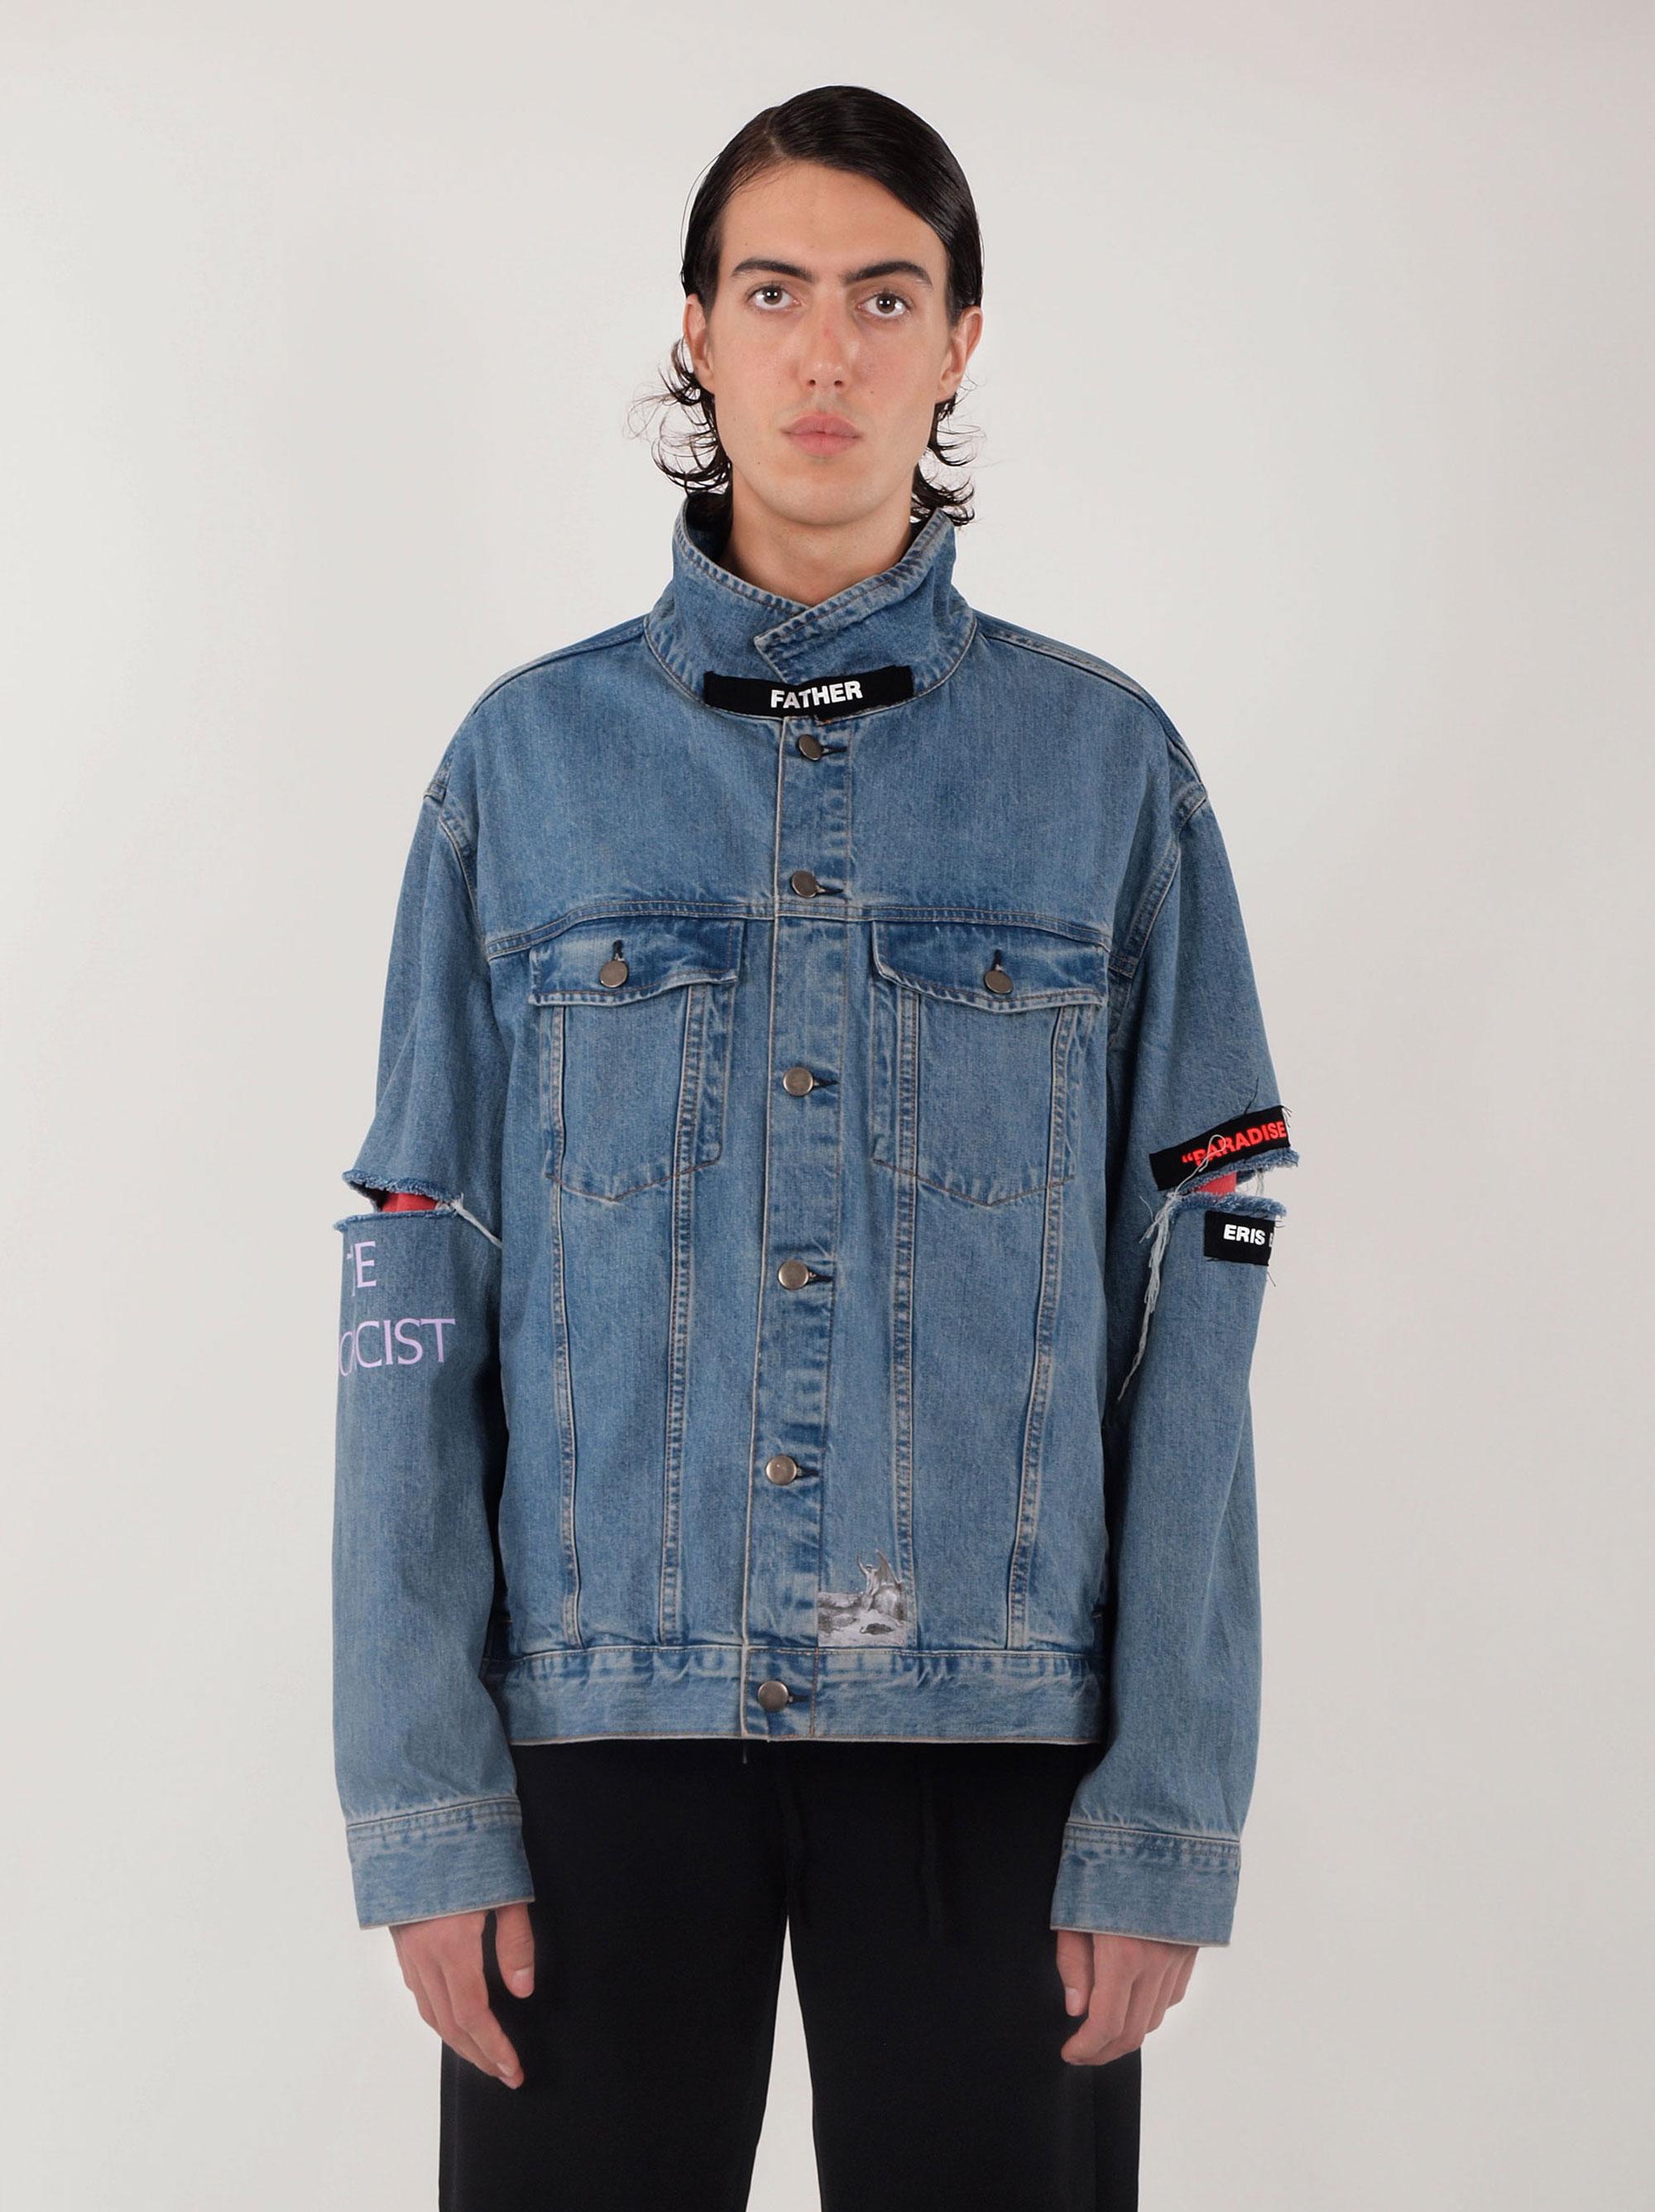 father-blue-jacket.jpg